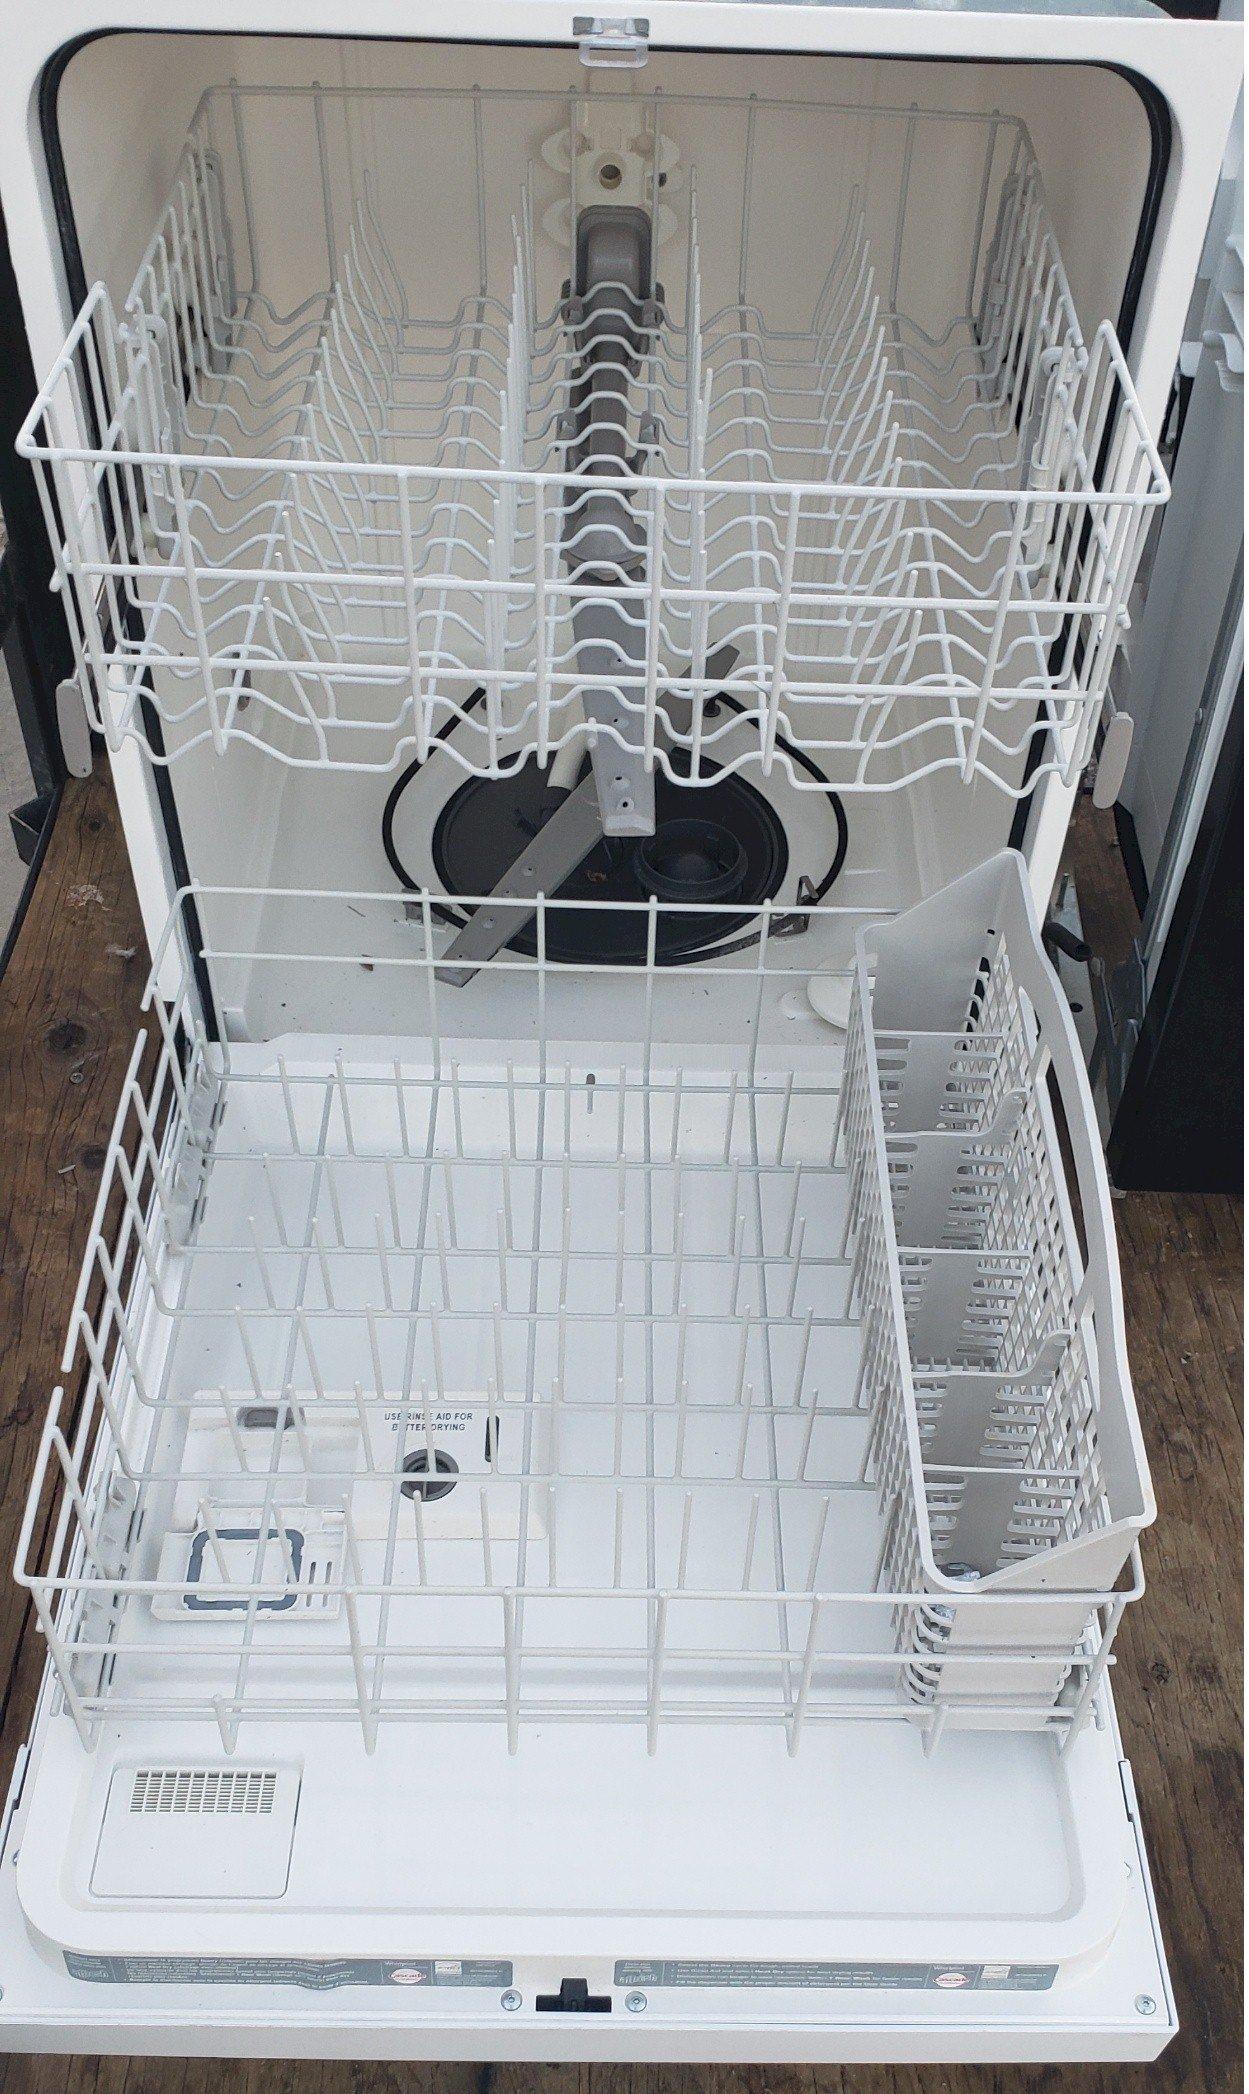 1 White Whirlpool Dishwasher inside